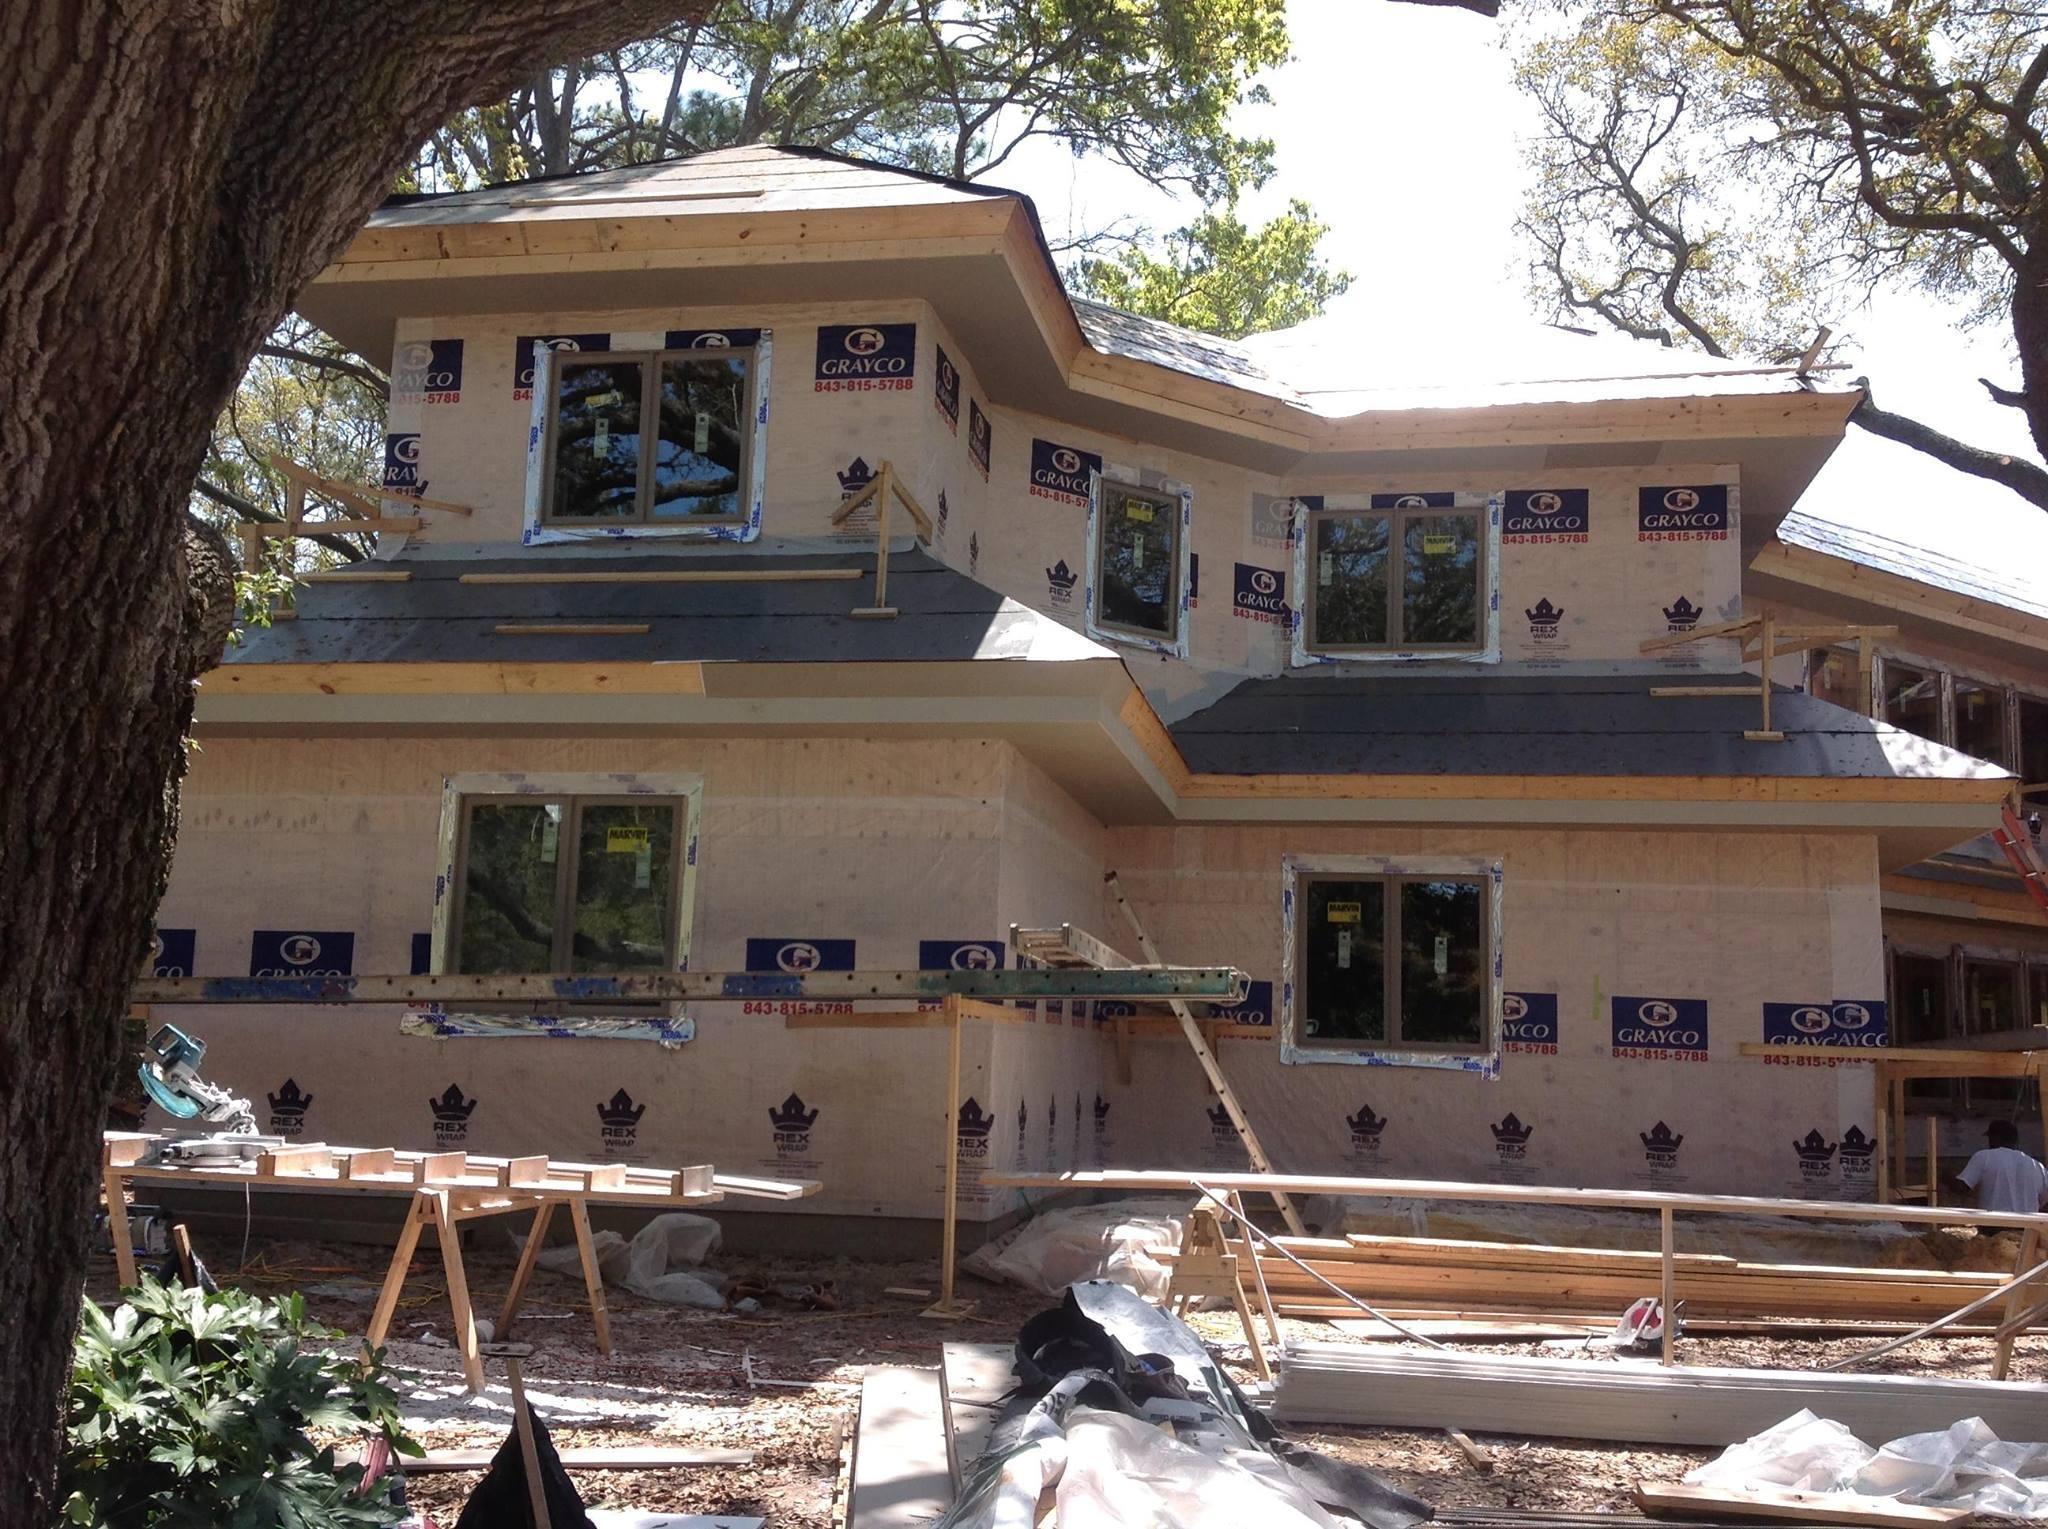 RoofCrafters-Savannah image 46